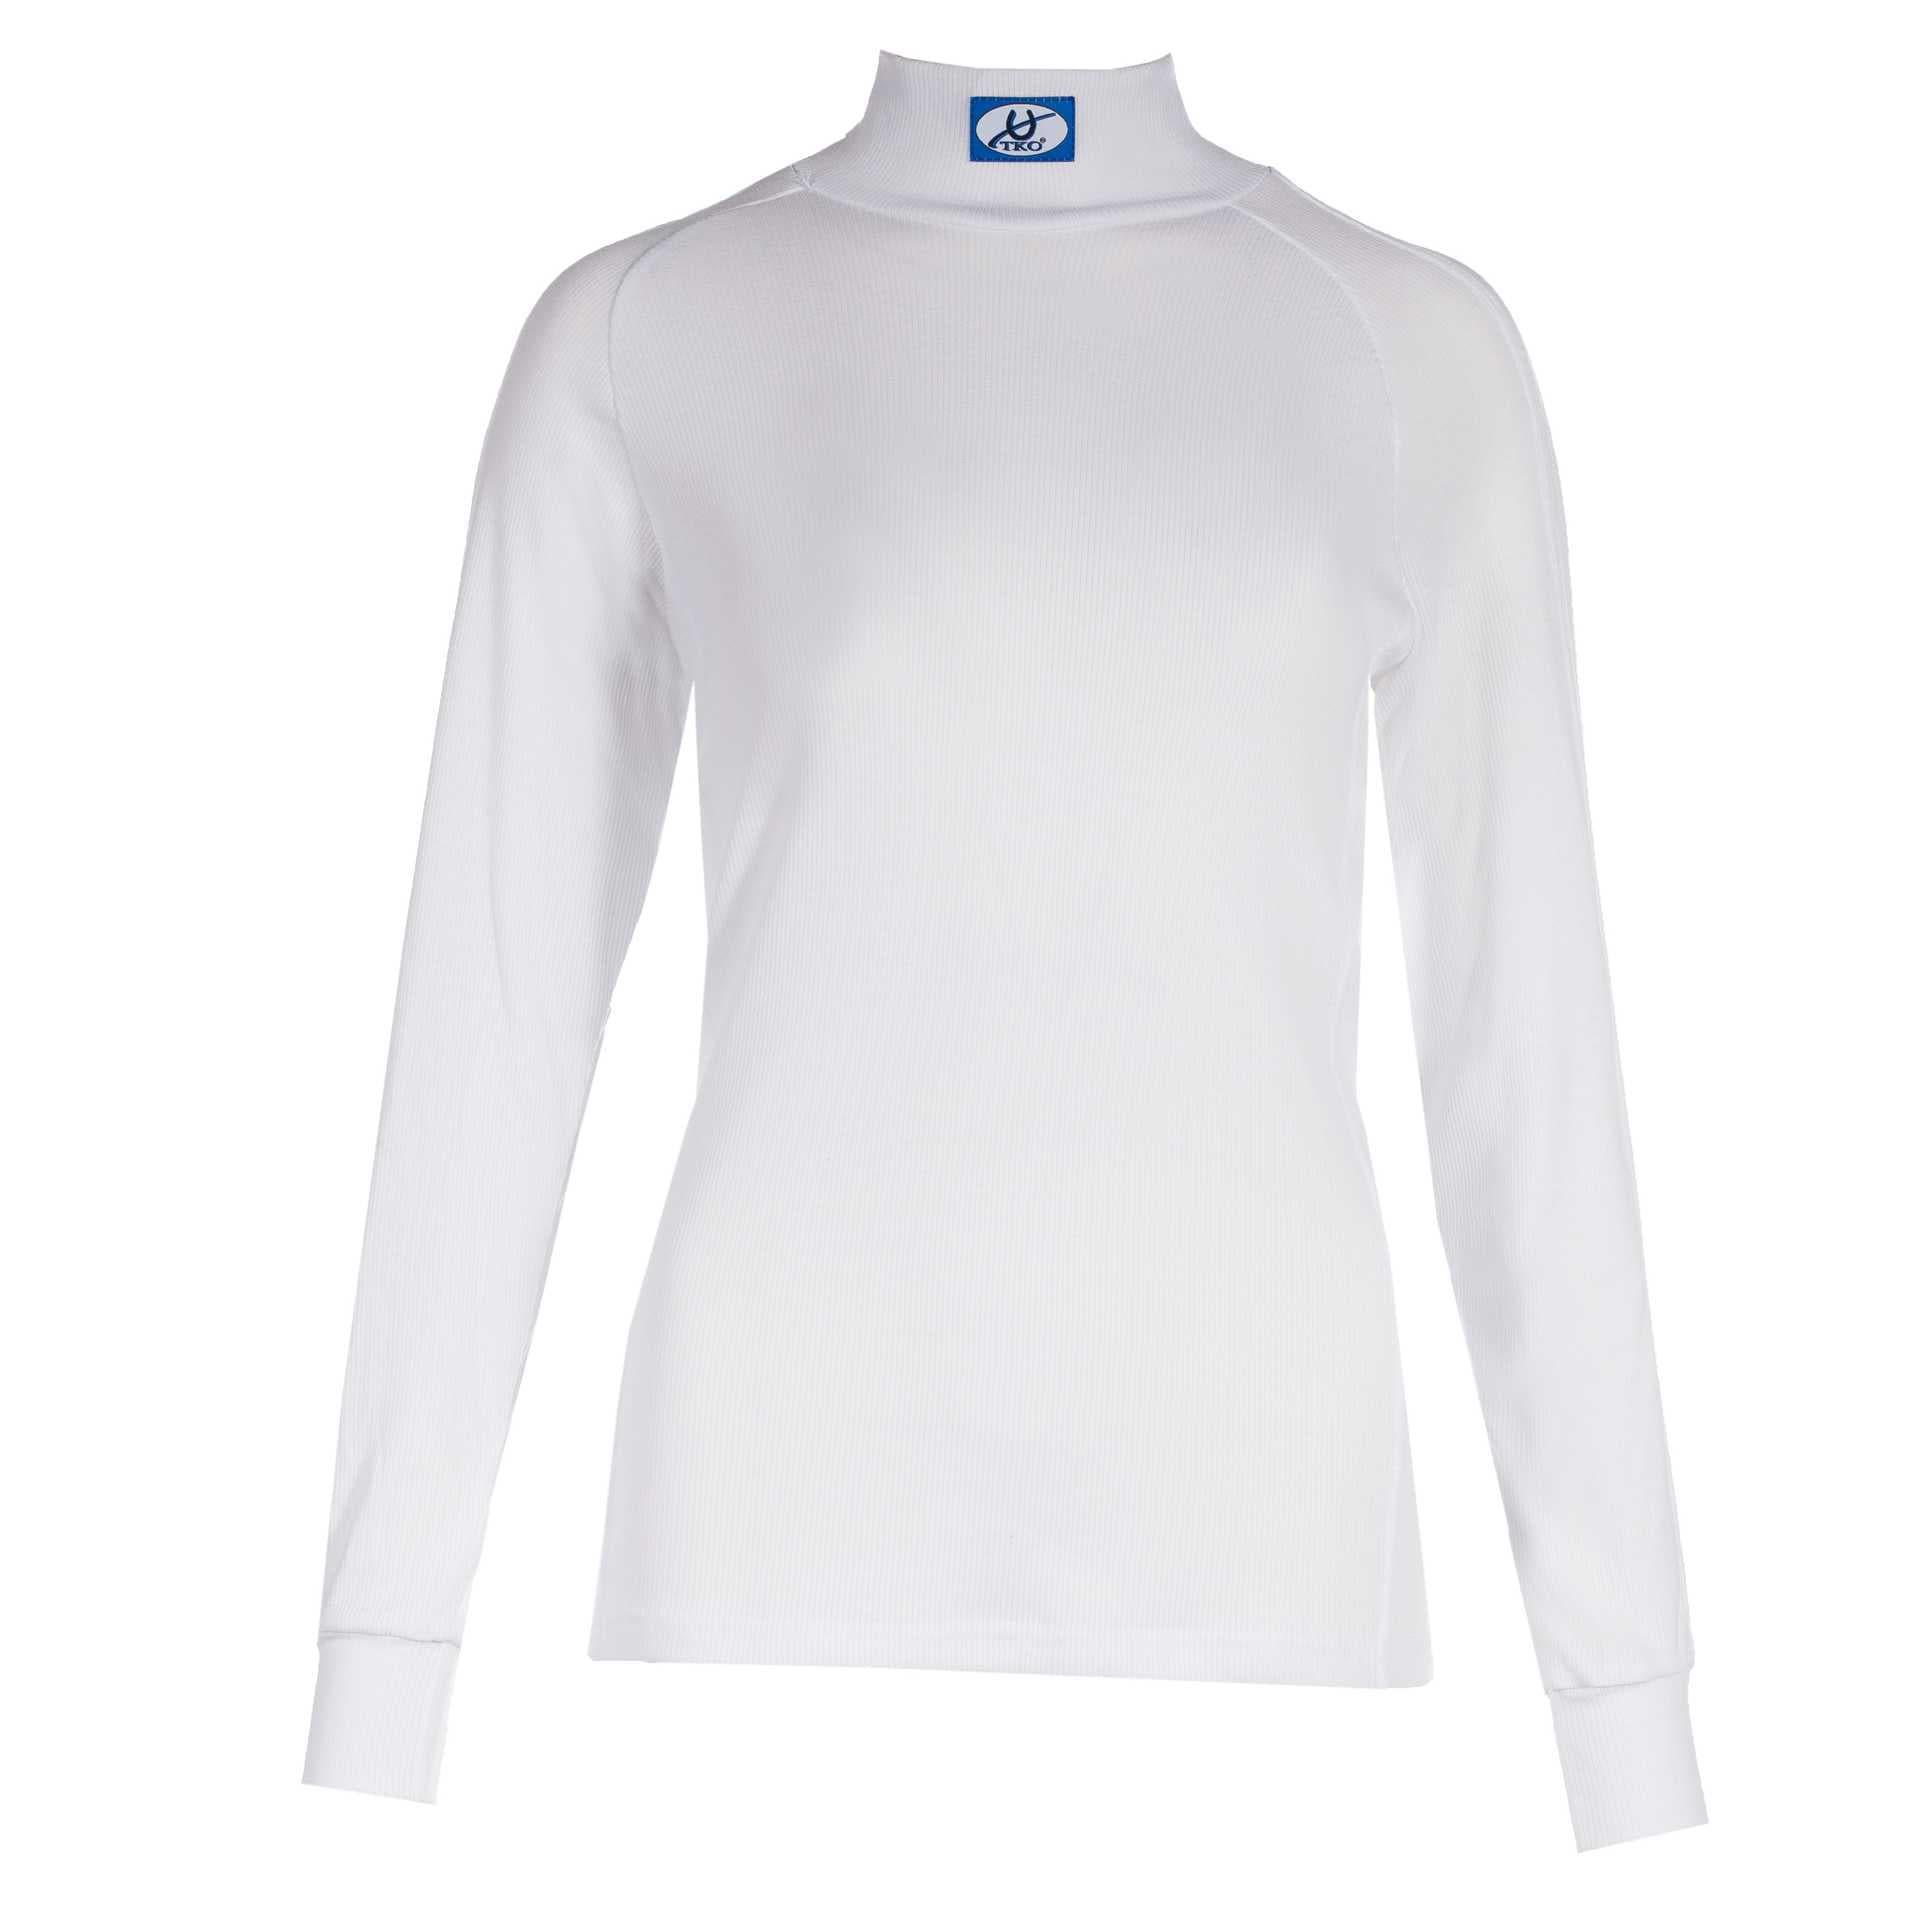 TKO Hurtigtørkende bomullsskjorte med lange ermer